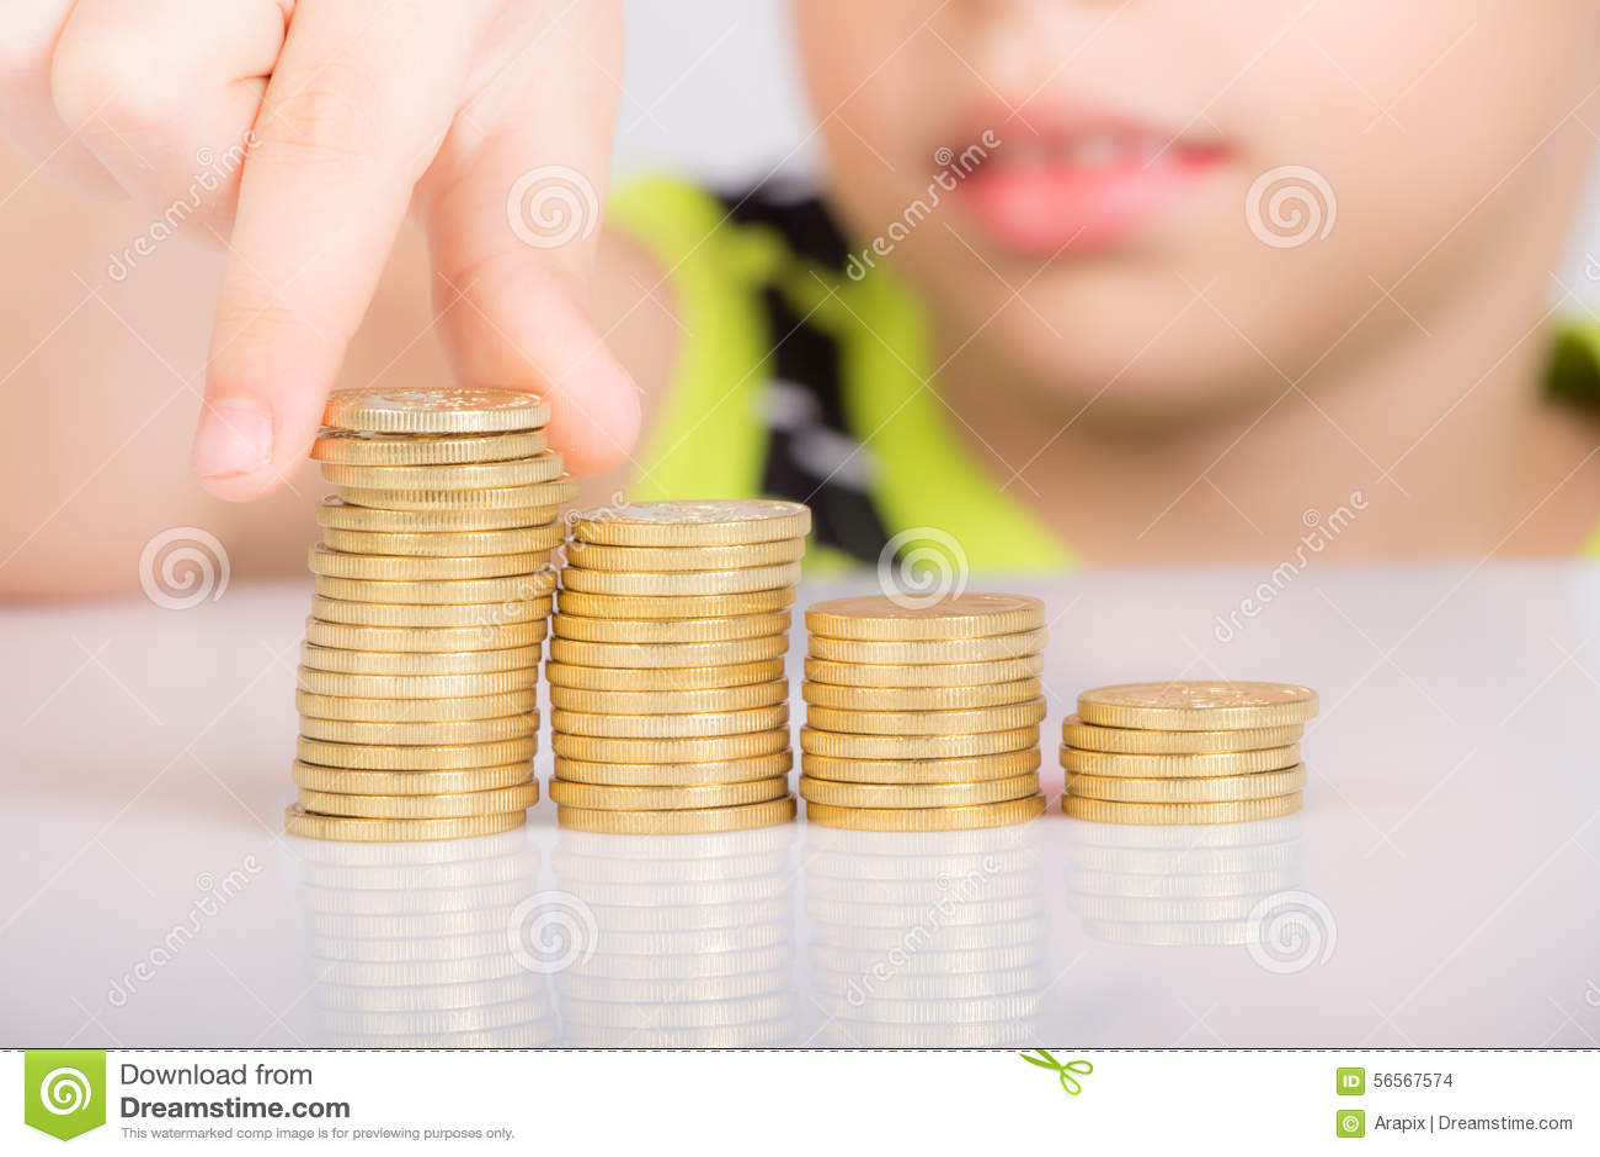 Мальчики монетки huawei nova 5t подарок